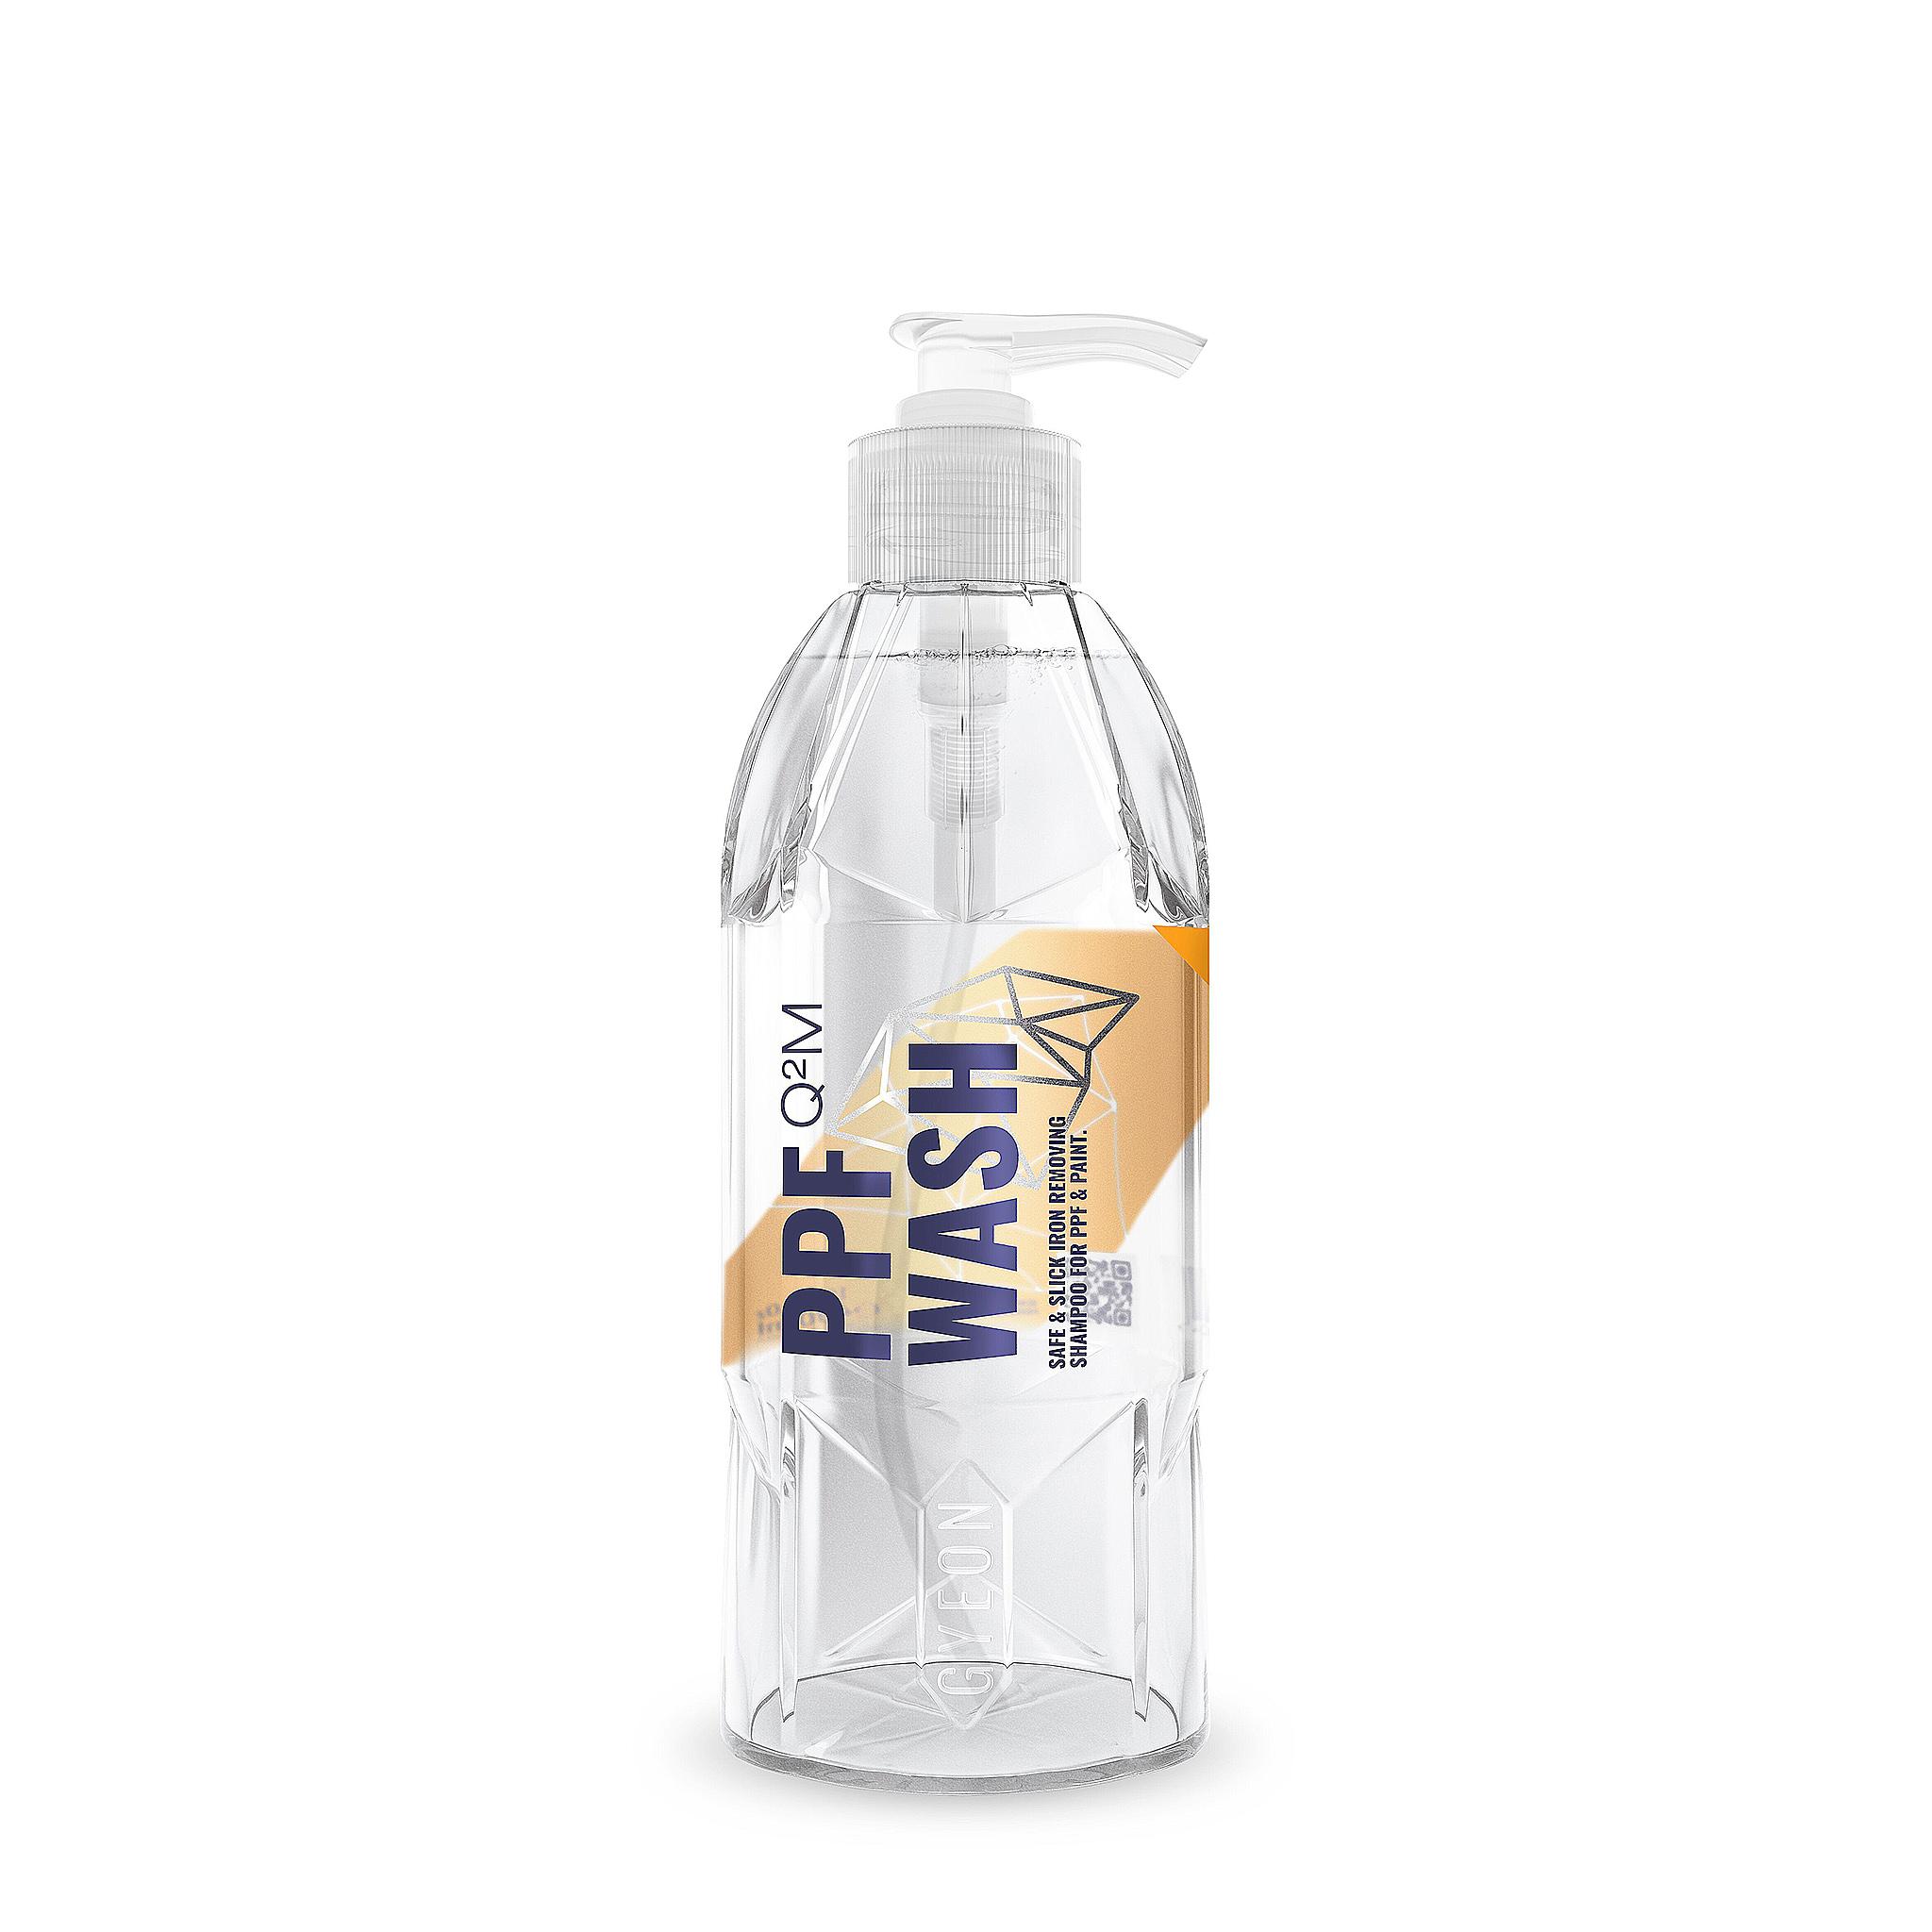 Bilschampo Gyeon Q²M PPF Wash, 400 ml